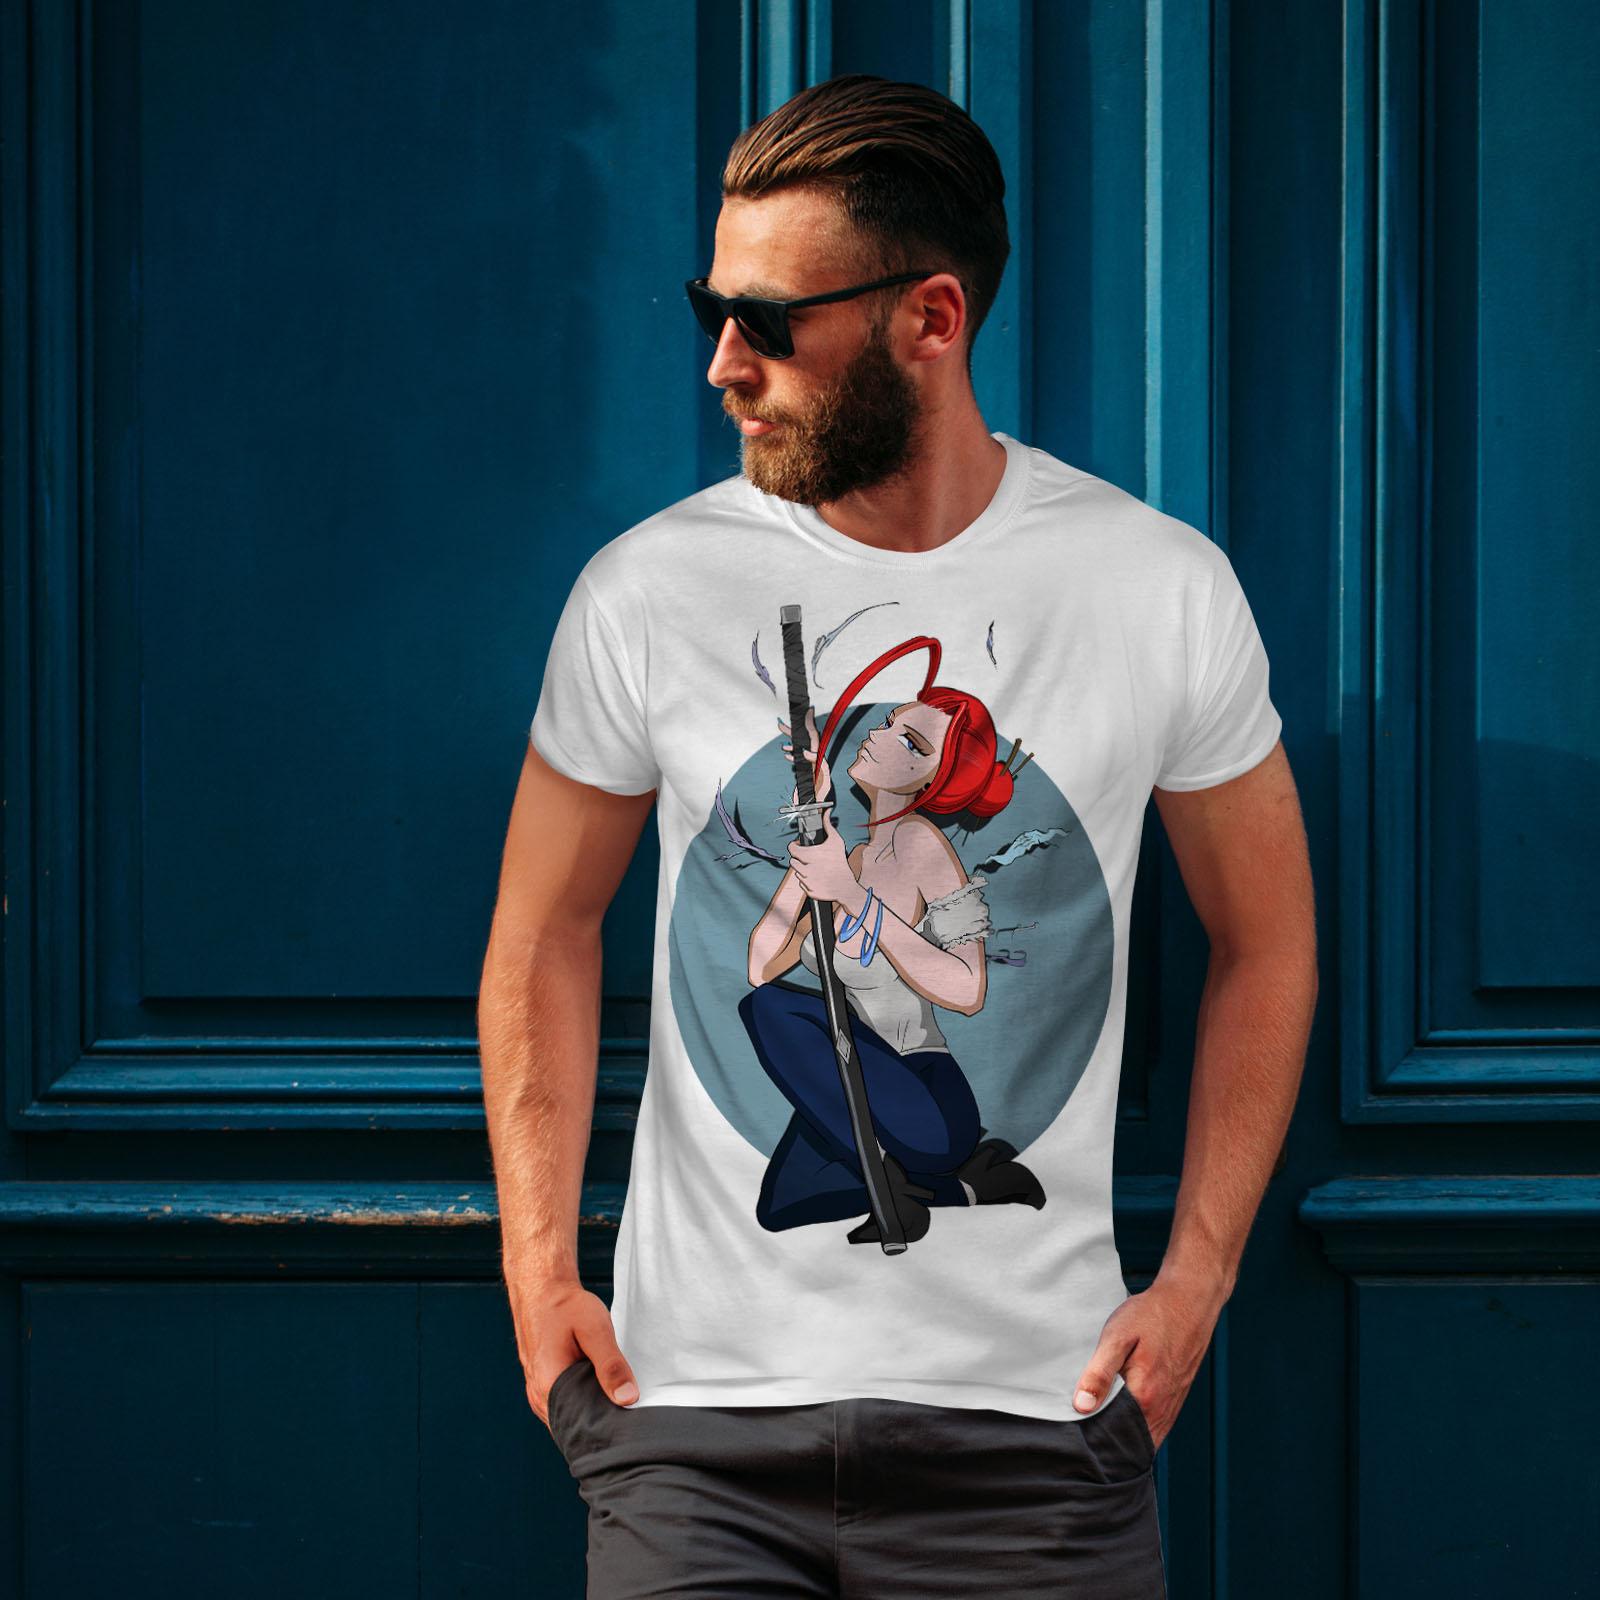 Wellcoda-Anime-Katana-Girl-Mens-T-shirt-Japanese-Graphic-Design-Printed-Tee thumbnail 10